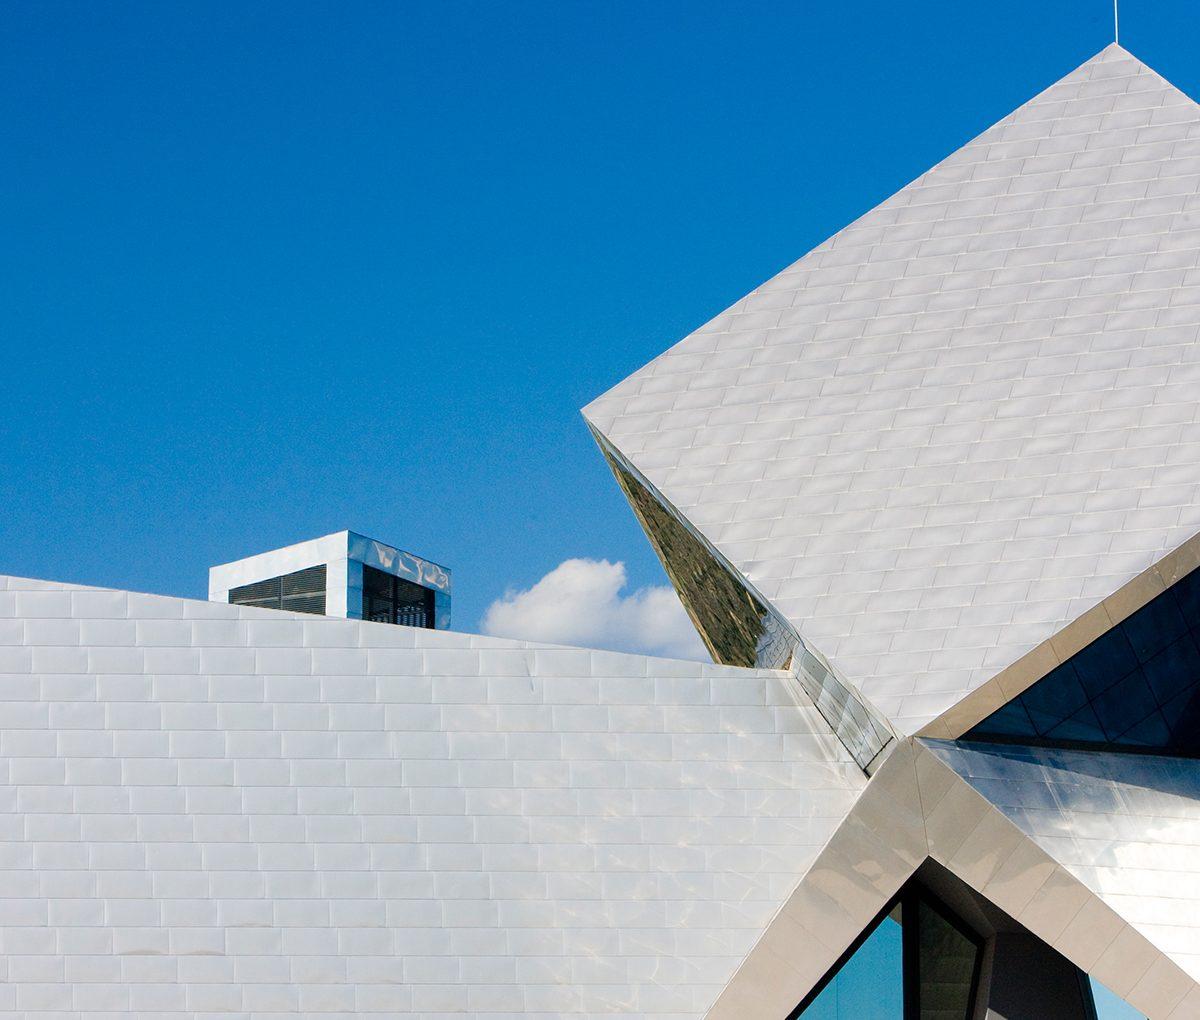 Materials: The Advantages of a Metal Roof